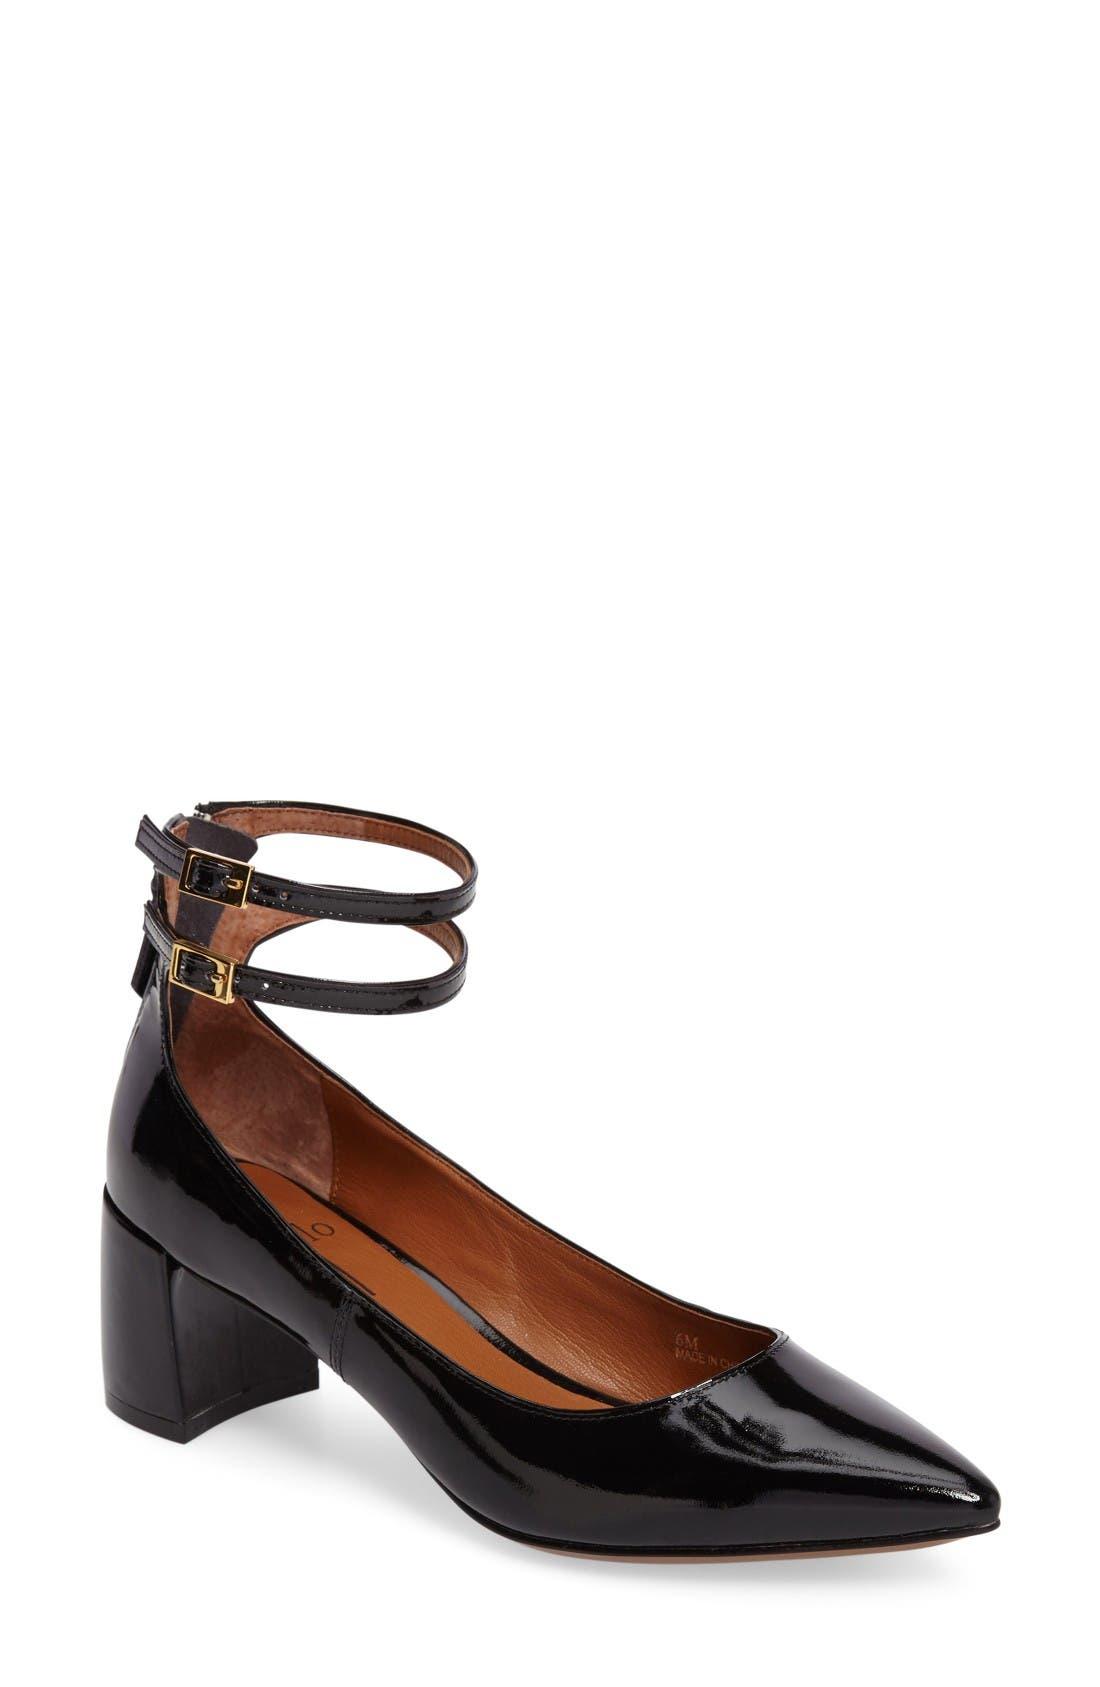 Main Image - Linea Paolo 'Noel' Pointy Toe Ankle Strap Pump (Women)